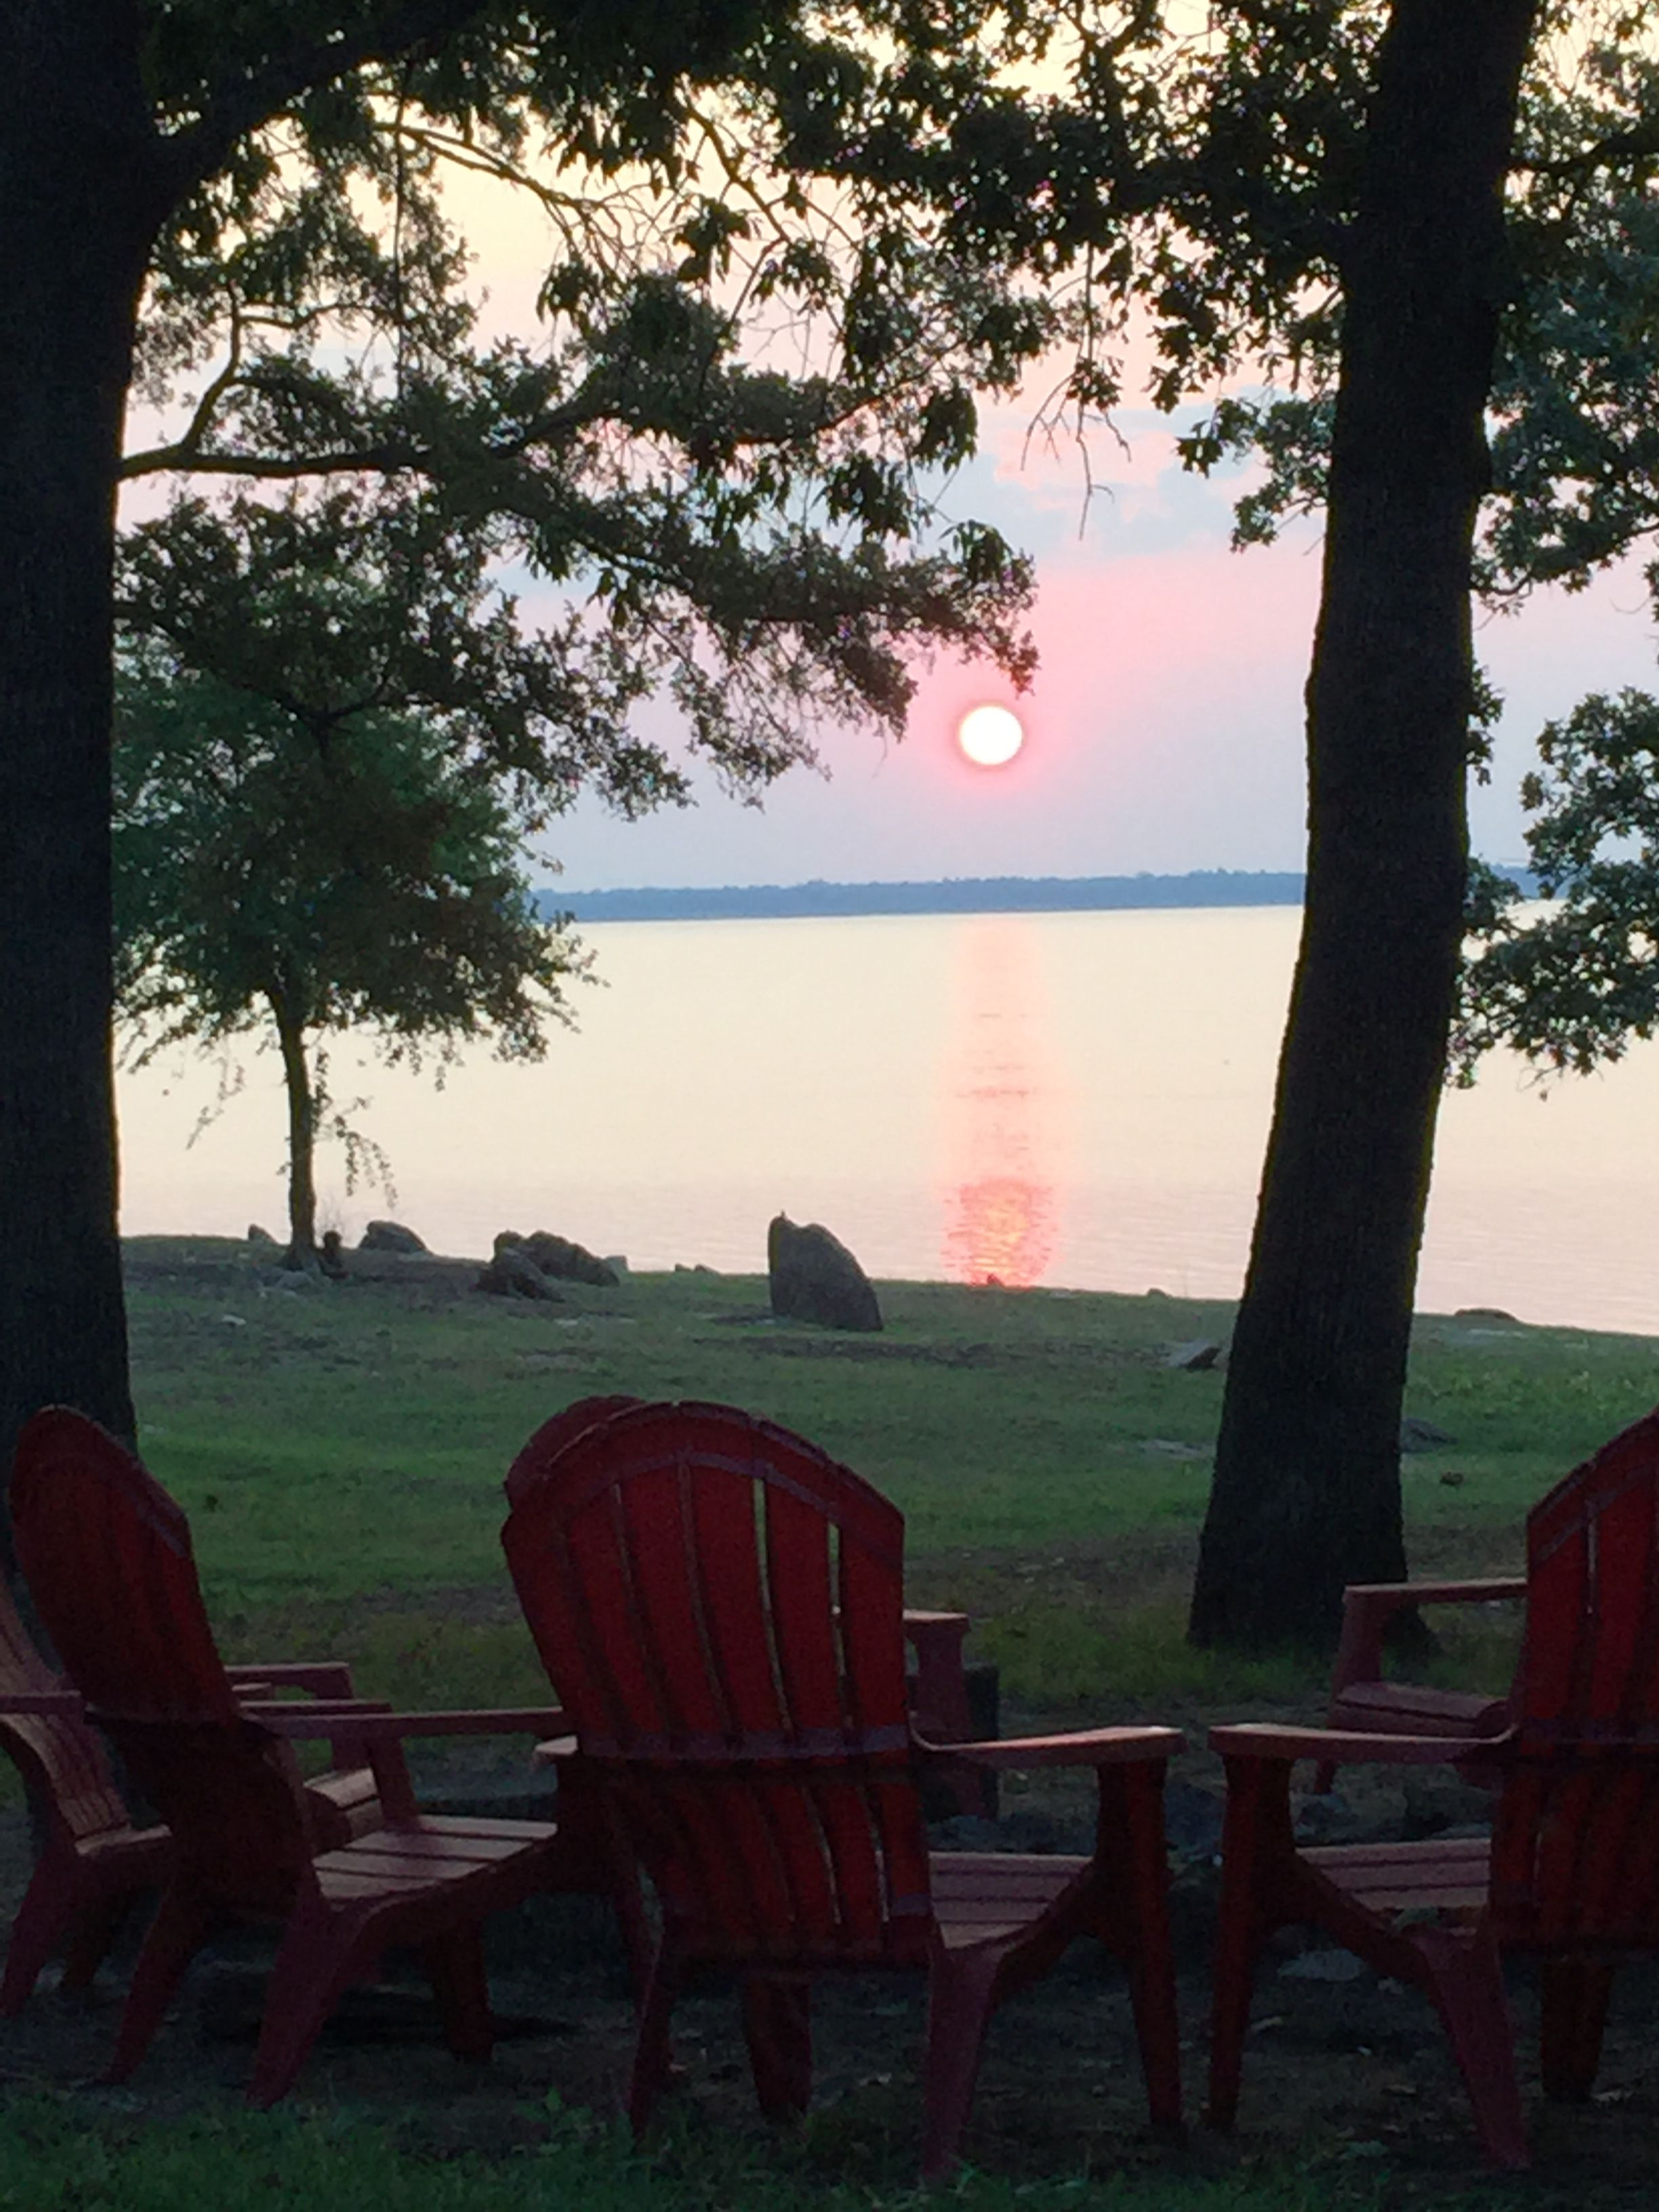 Lake texoma lake texoma pottsboro lake